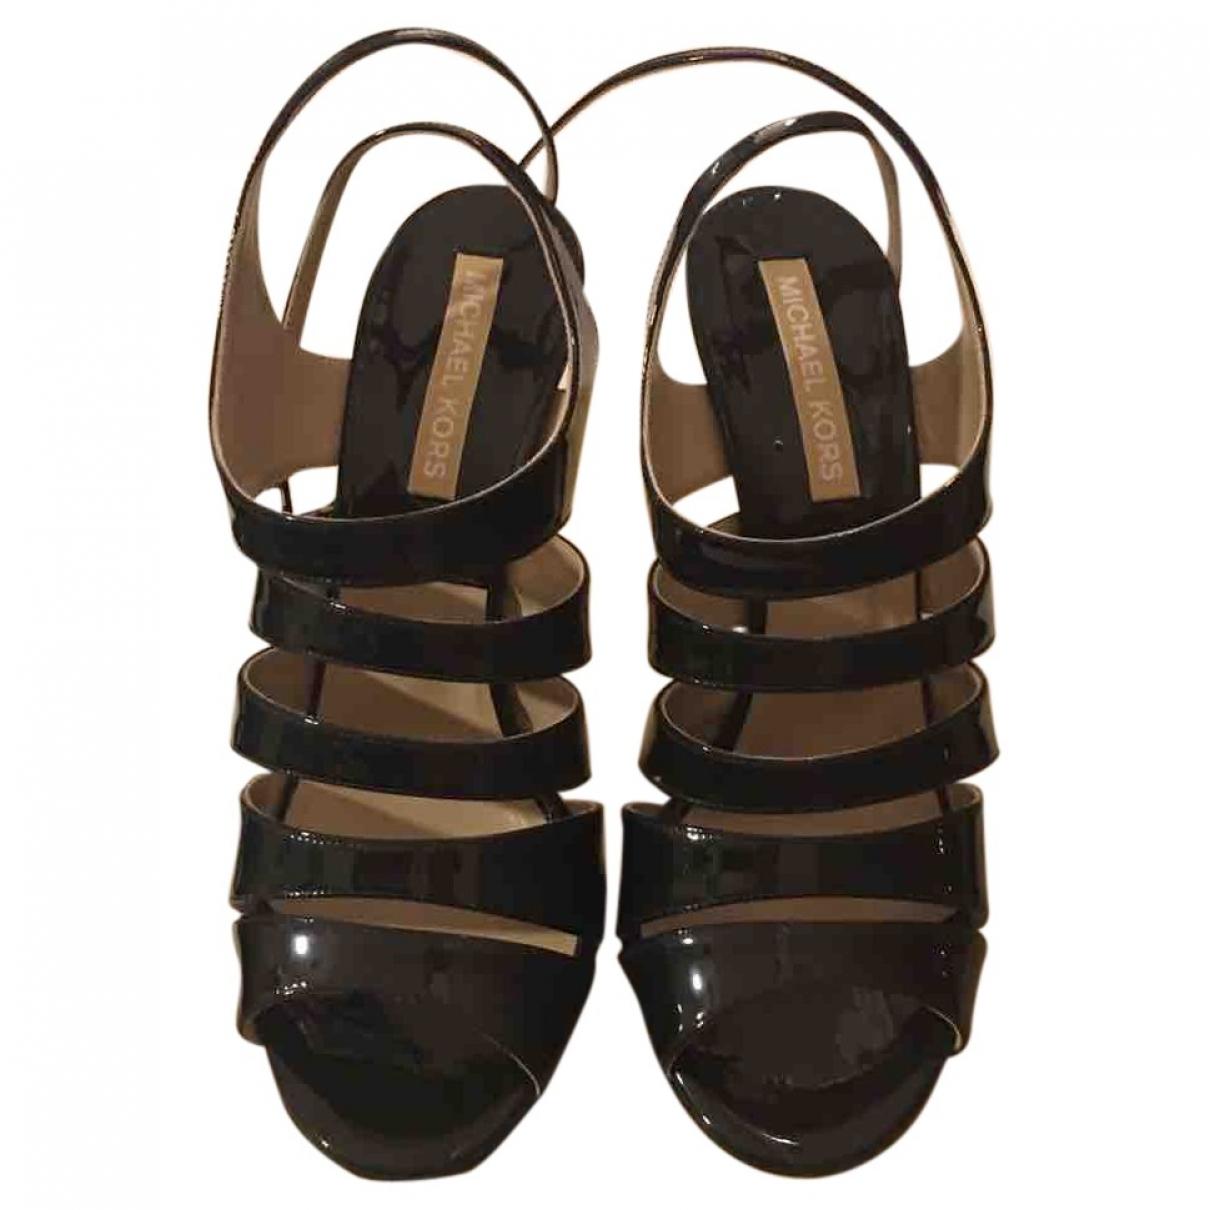 Michael Kors \N Black Patent leather Heels for Women 37 EU